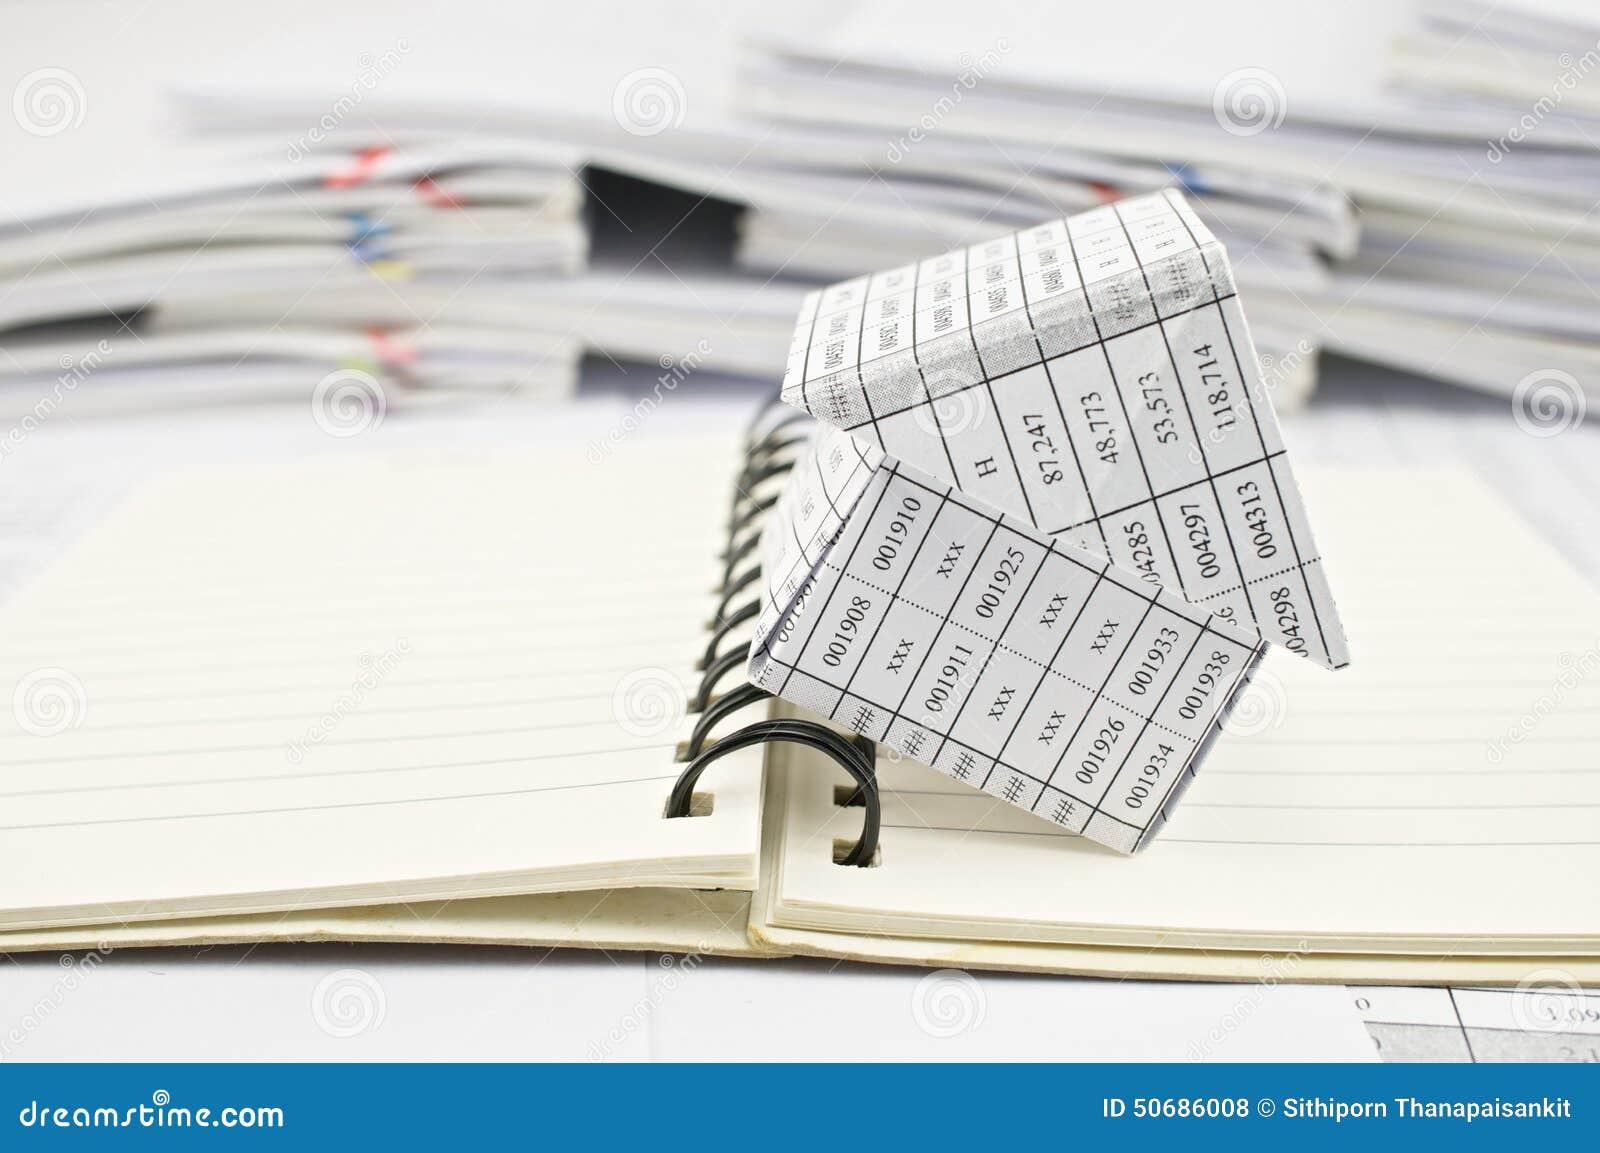 Download 关闭房子并且打开笔记本 库存照片. 图片 包括有 工作, 附注, 报表, 收货, 空白, 胡言乱语的, 商业 - 50686008